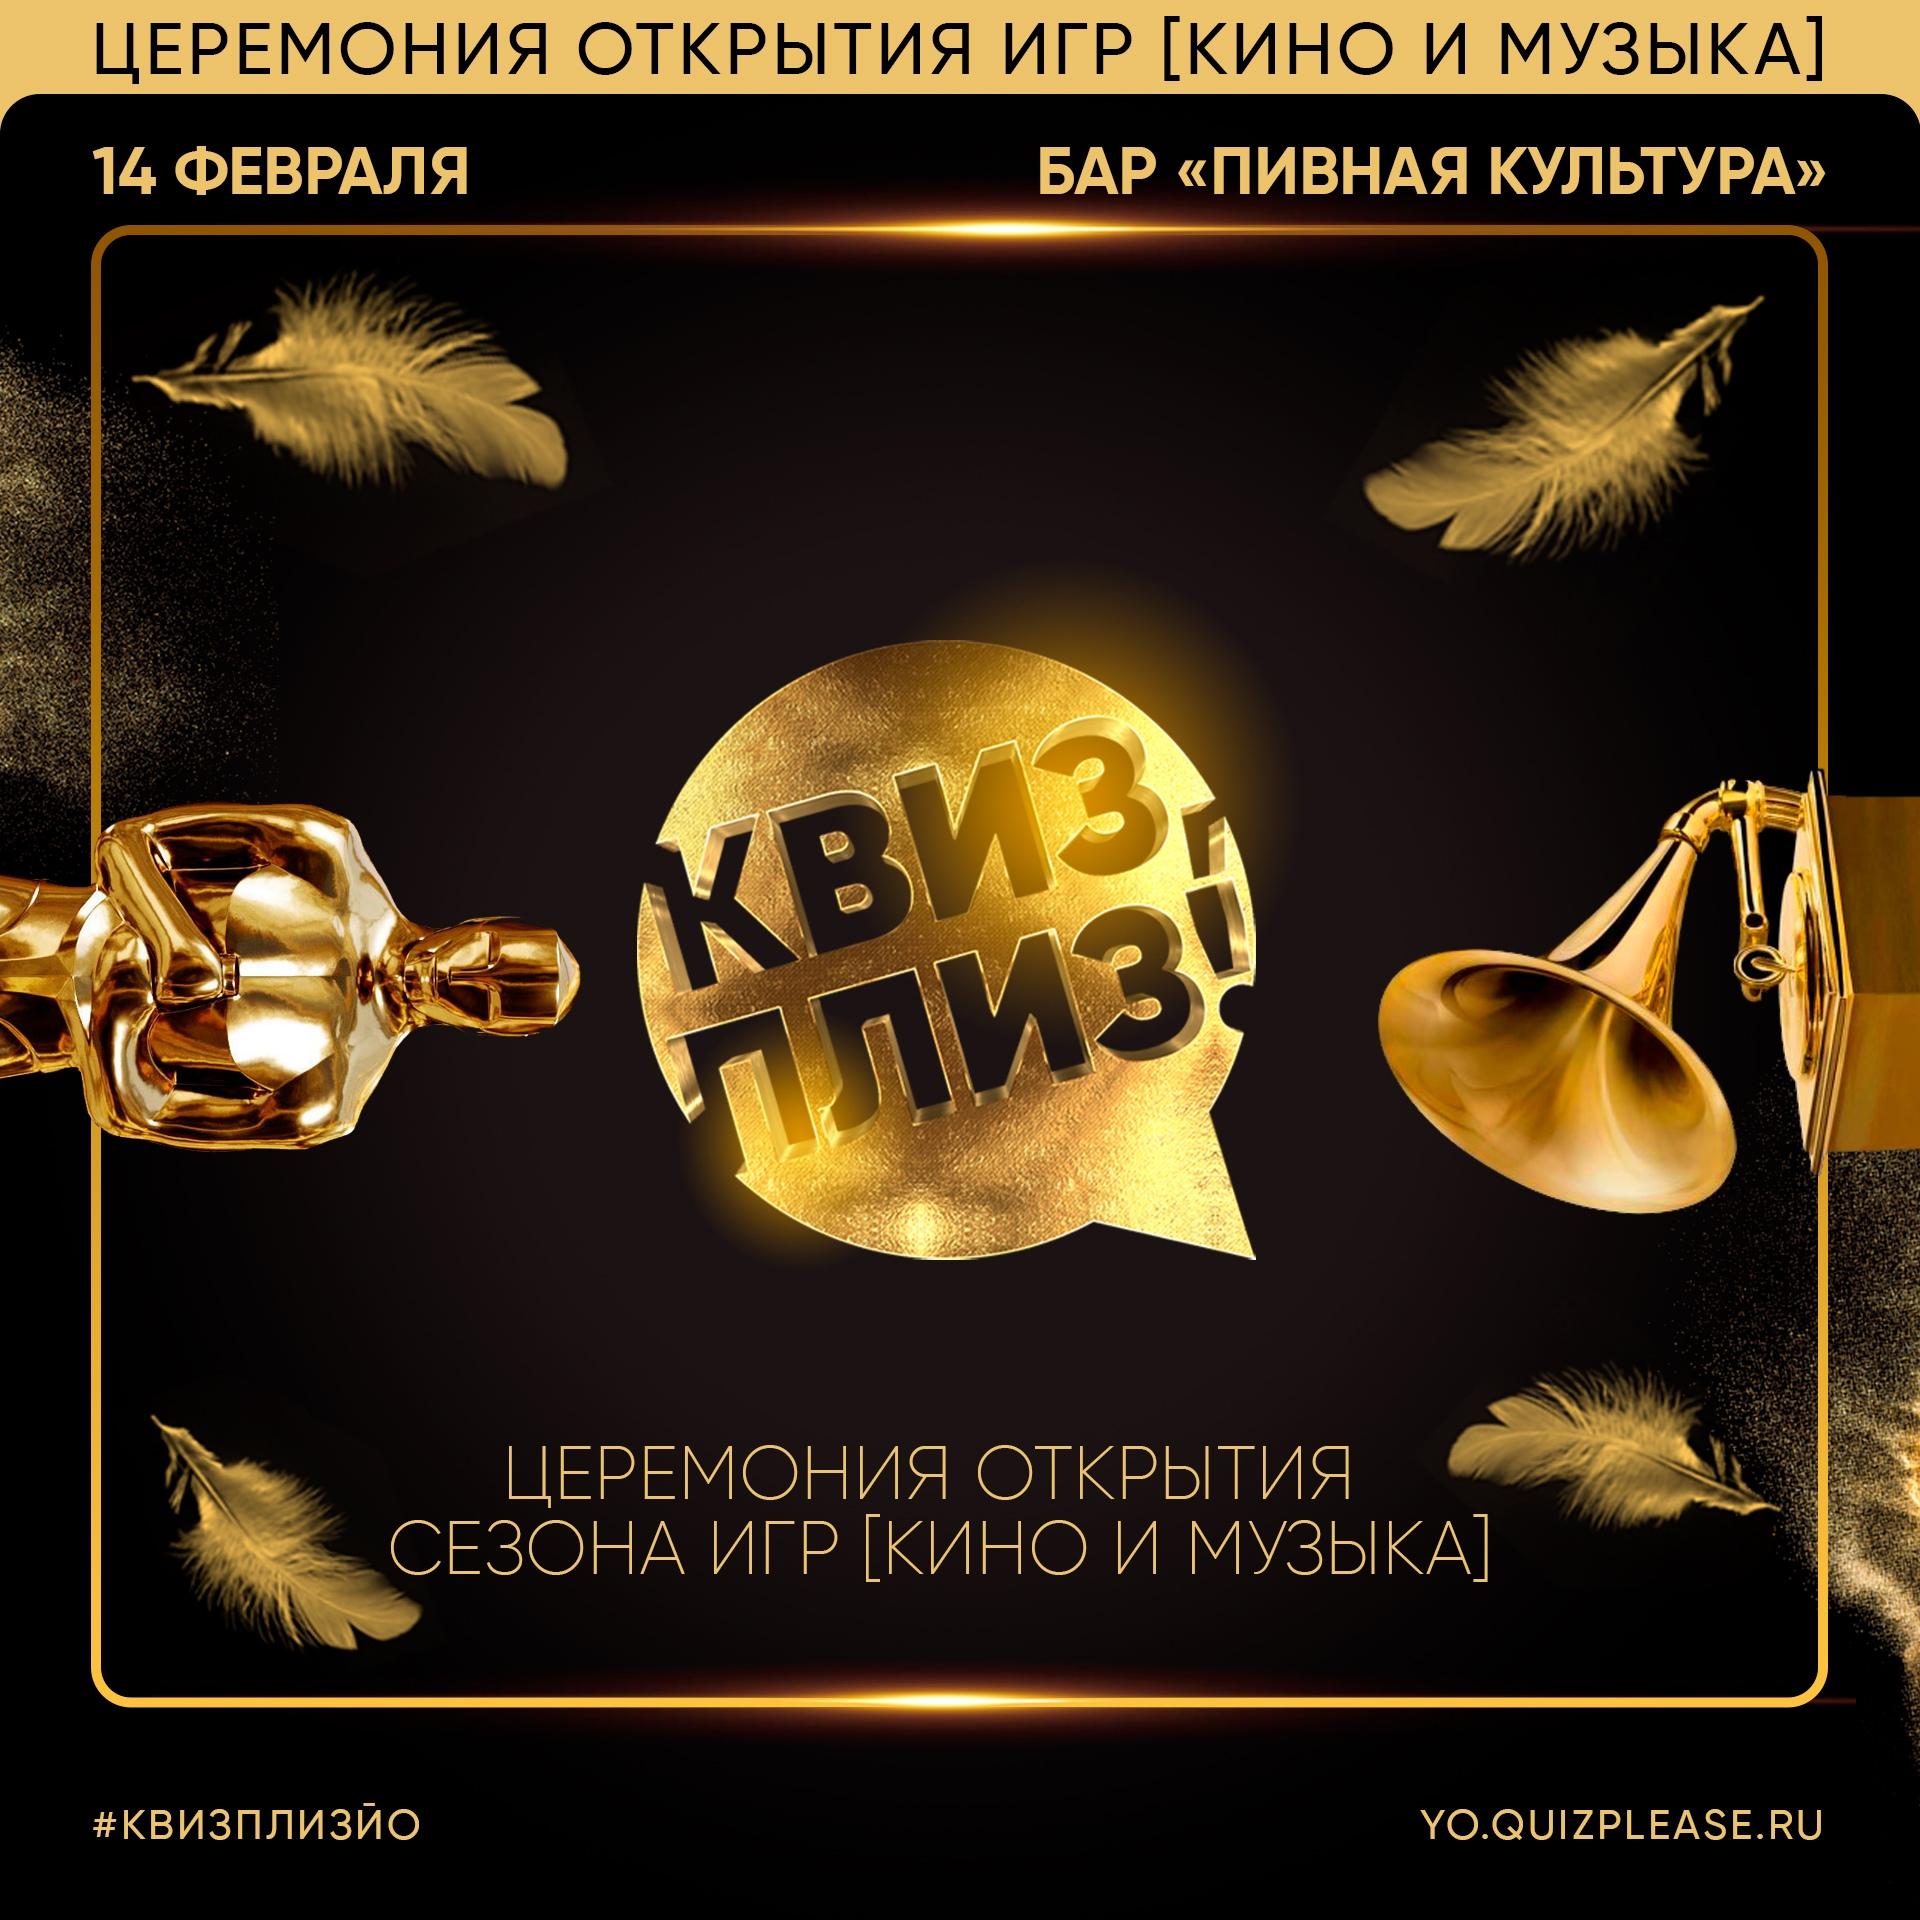 Паб, бар «Пивная Культура» - Вконтакте